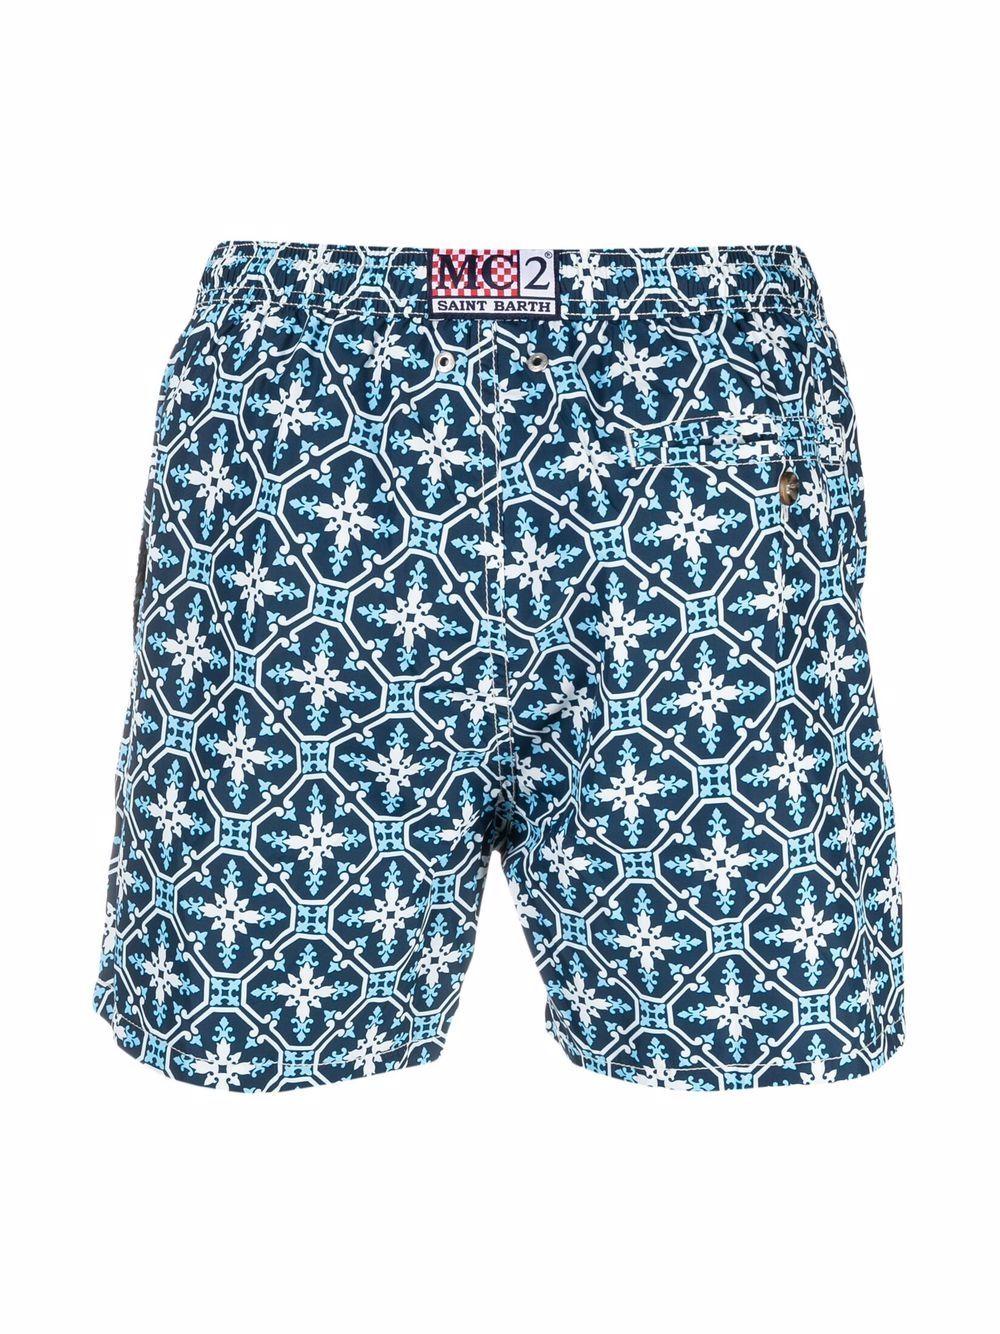 Blue recycled polyester Maiolica print swim shorts  MC2 |  | LIGHTING 70-ACAPULCO6131